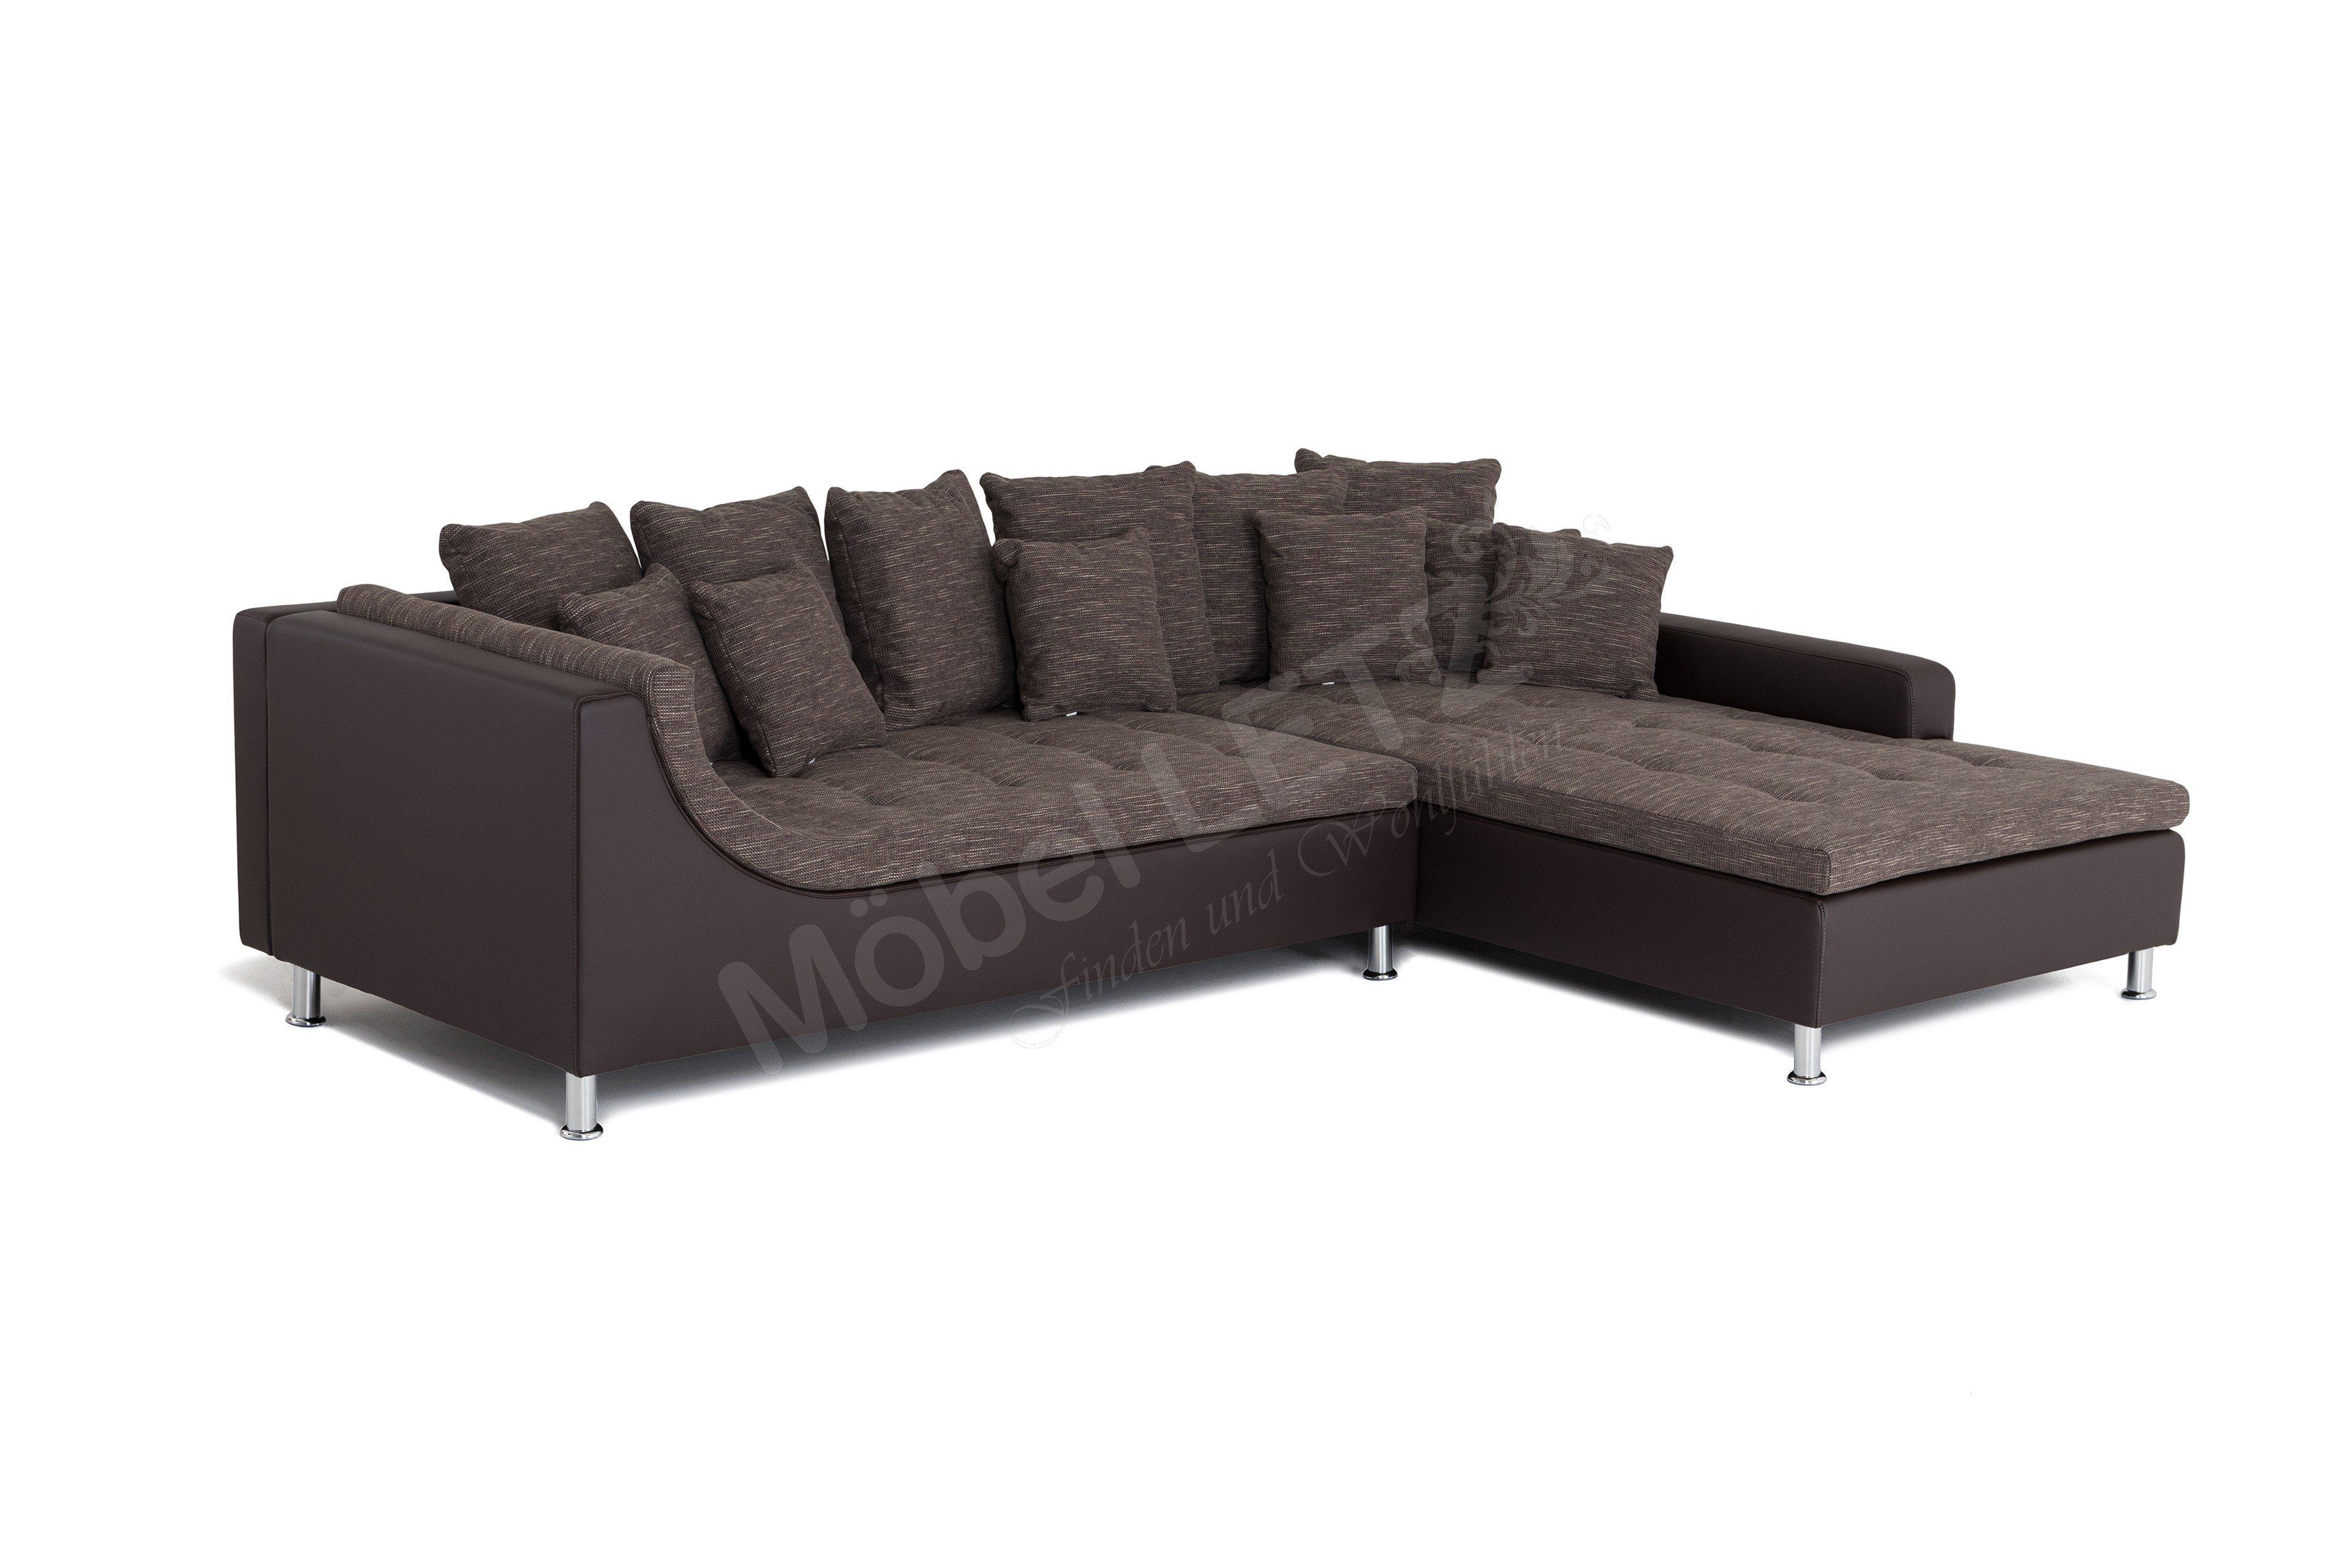 kollektion letz berit polstergarnitur braun m bel letz ihr online shop. Black Bedroom Furniture Sets. Home Design Ideas